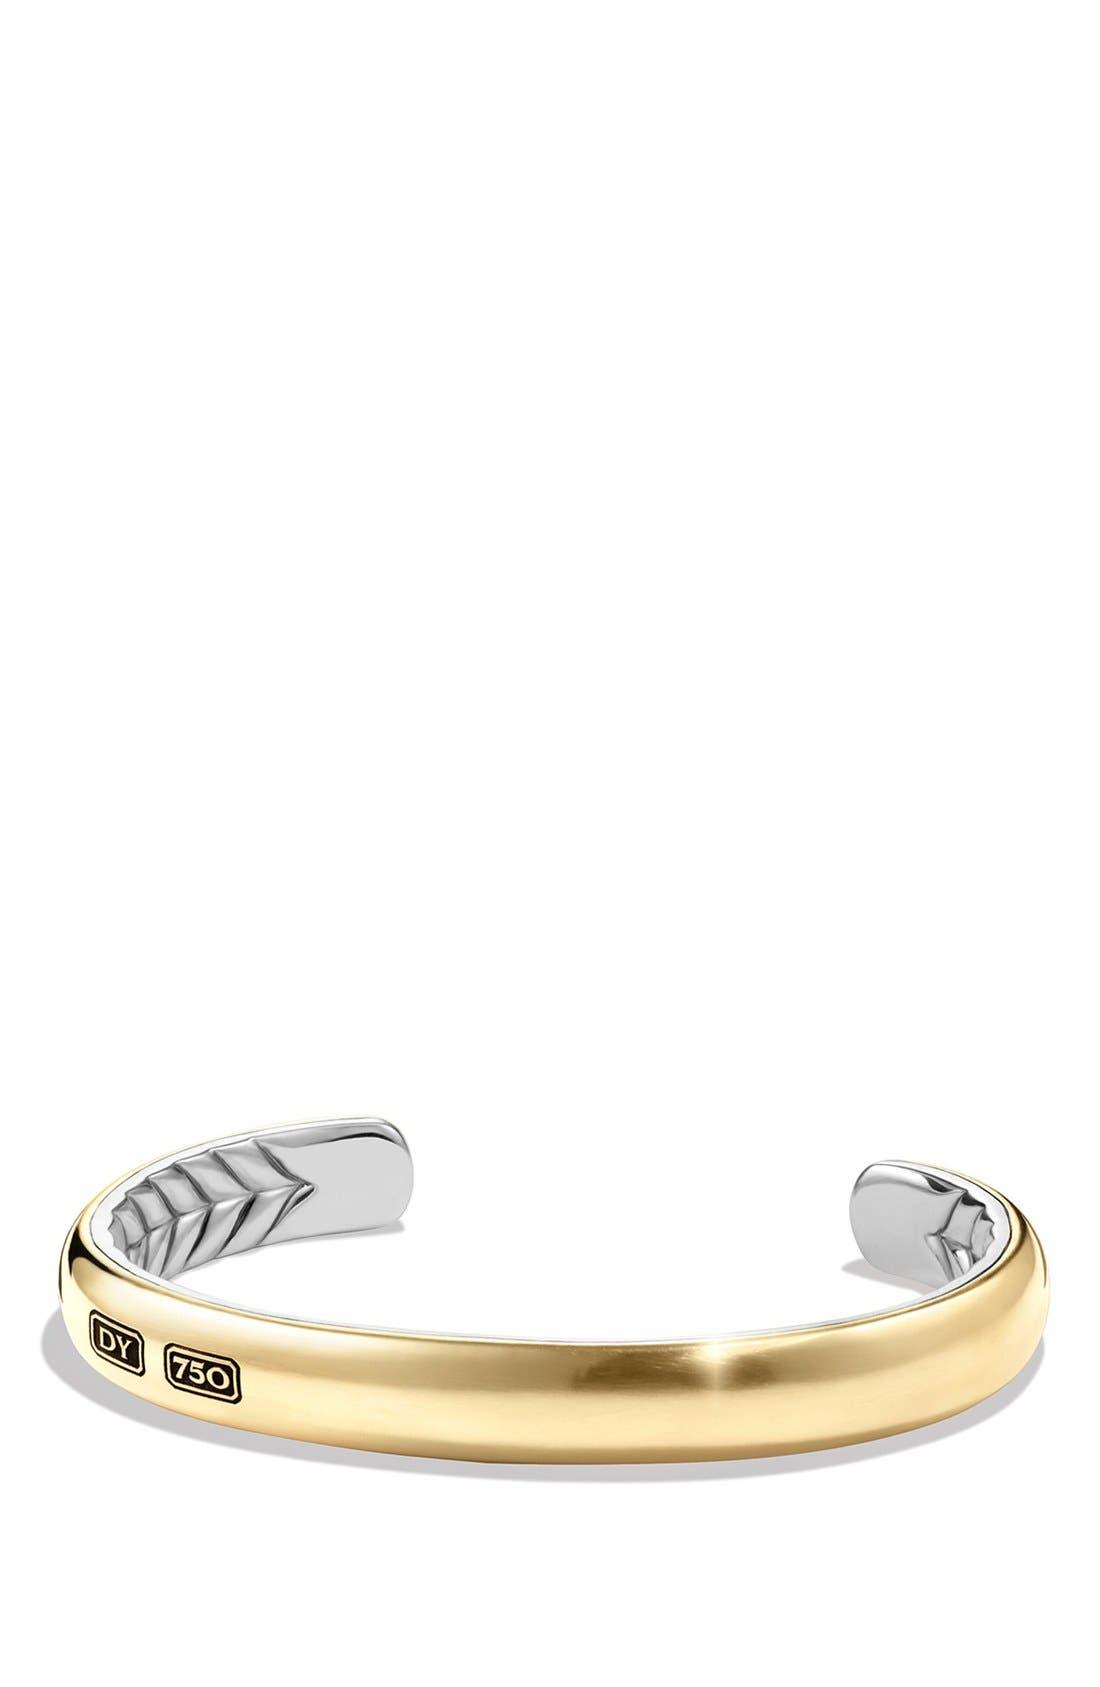 Alternate Image 1 Selected - David Yurman 'Streamline' Cuff Bracelet with 18K Gold